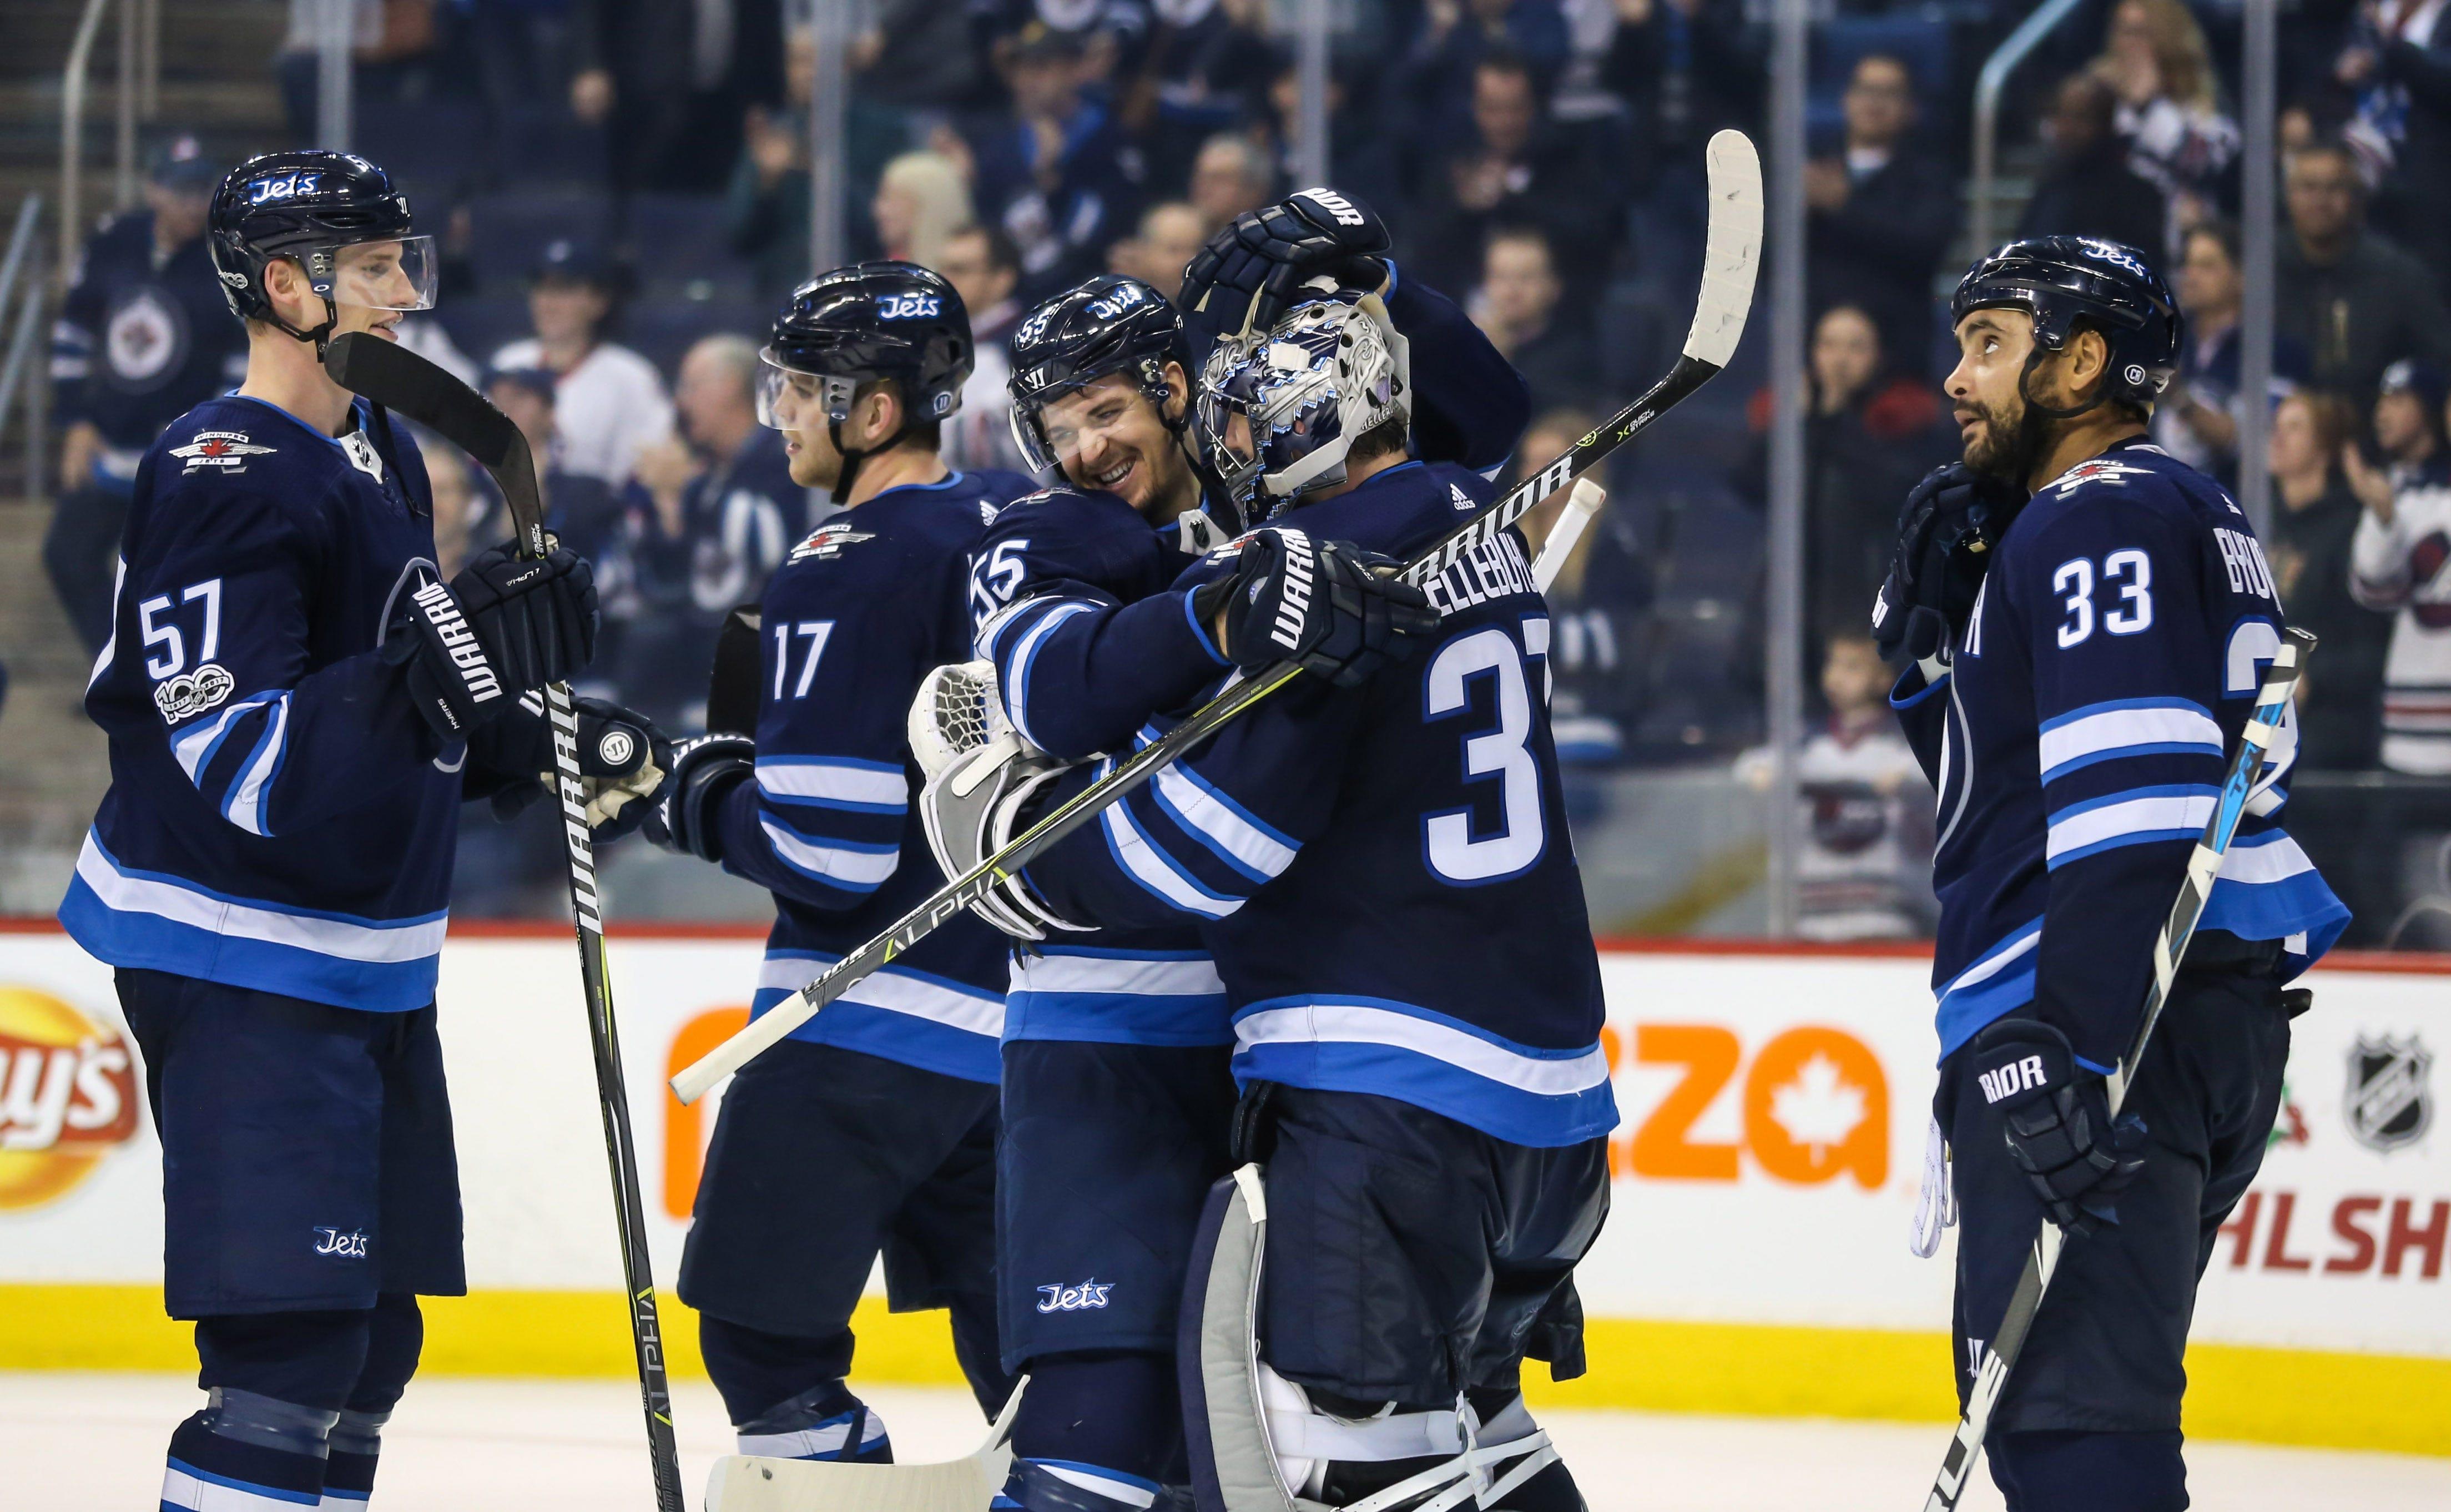 Winnipeg Jets rebuilt on strength of first-round draft picks